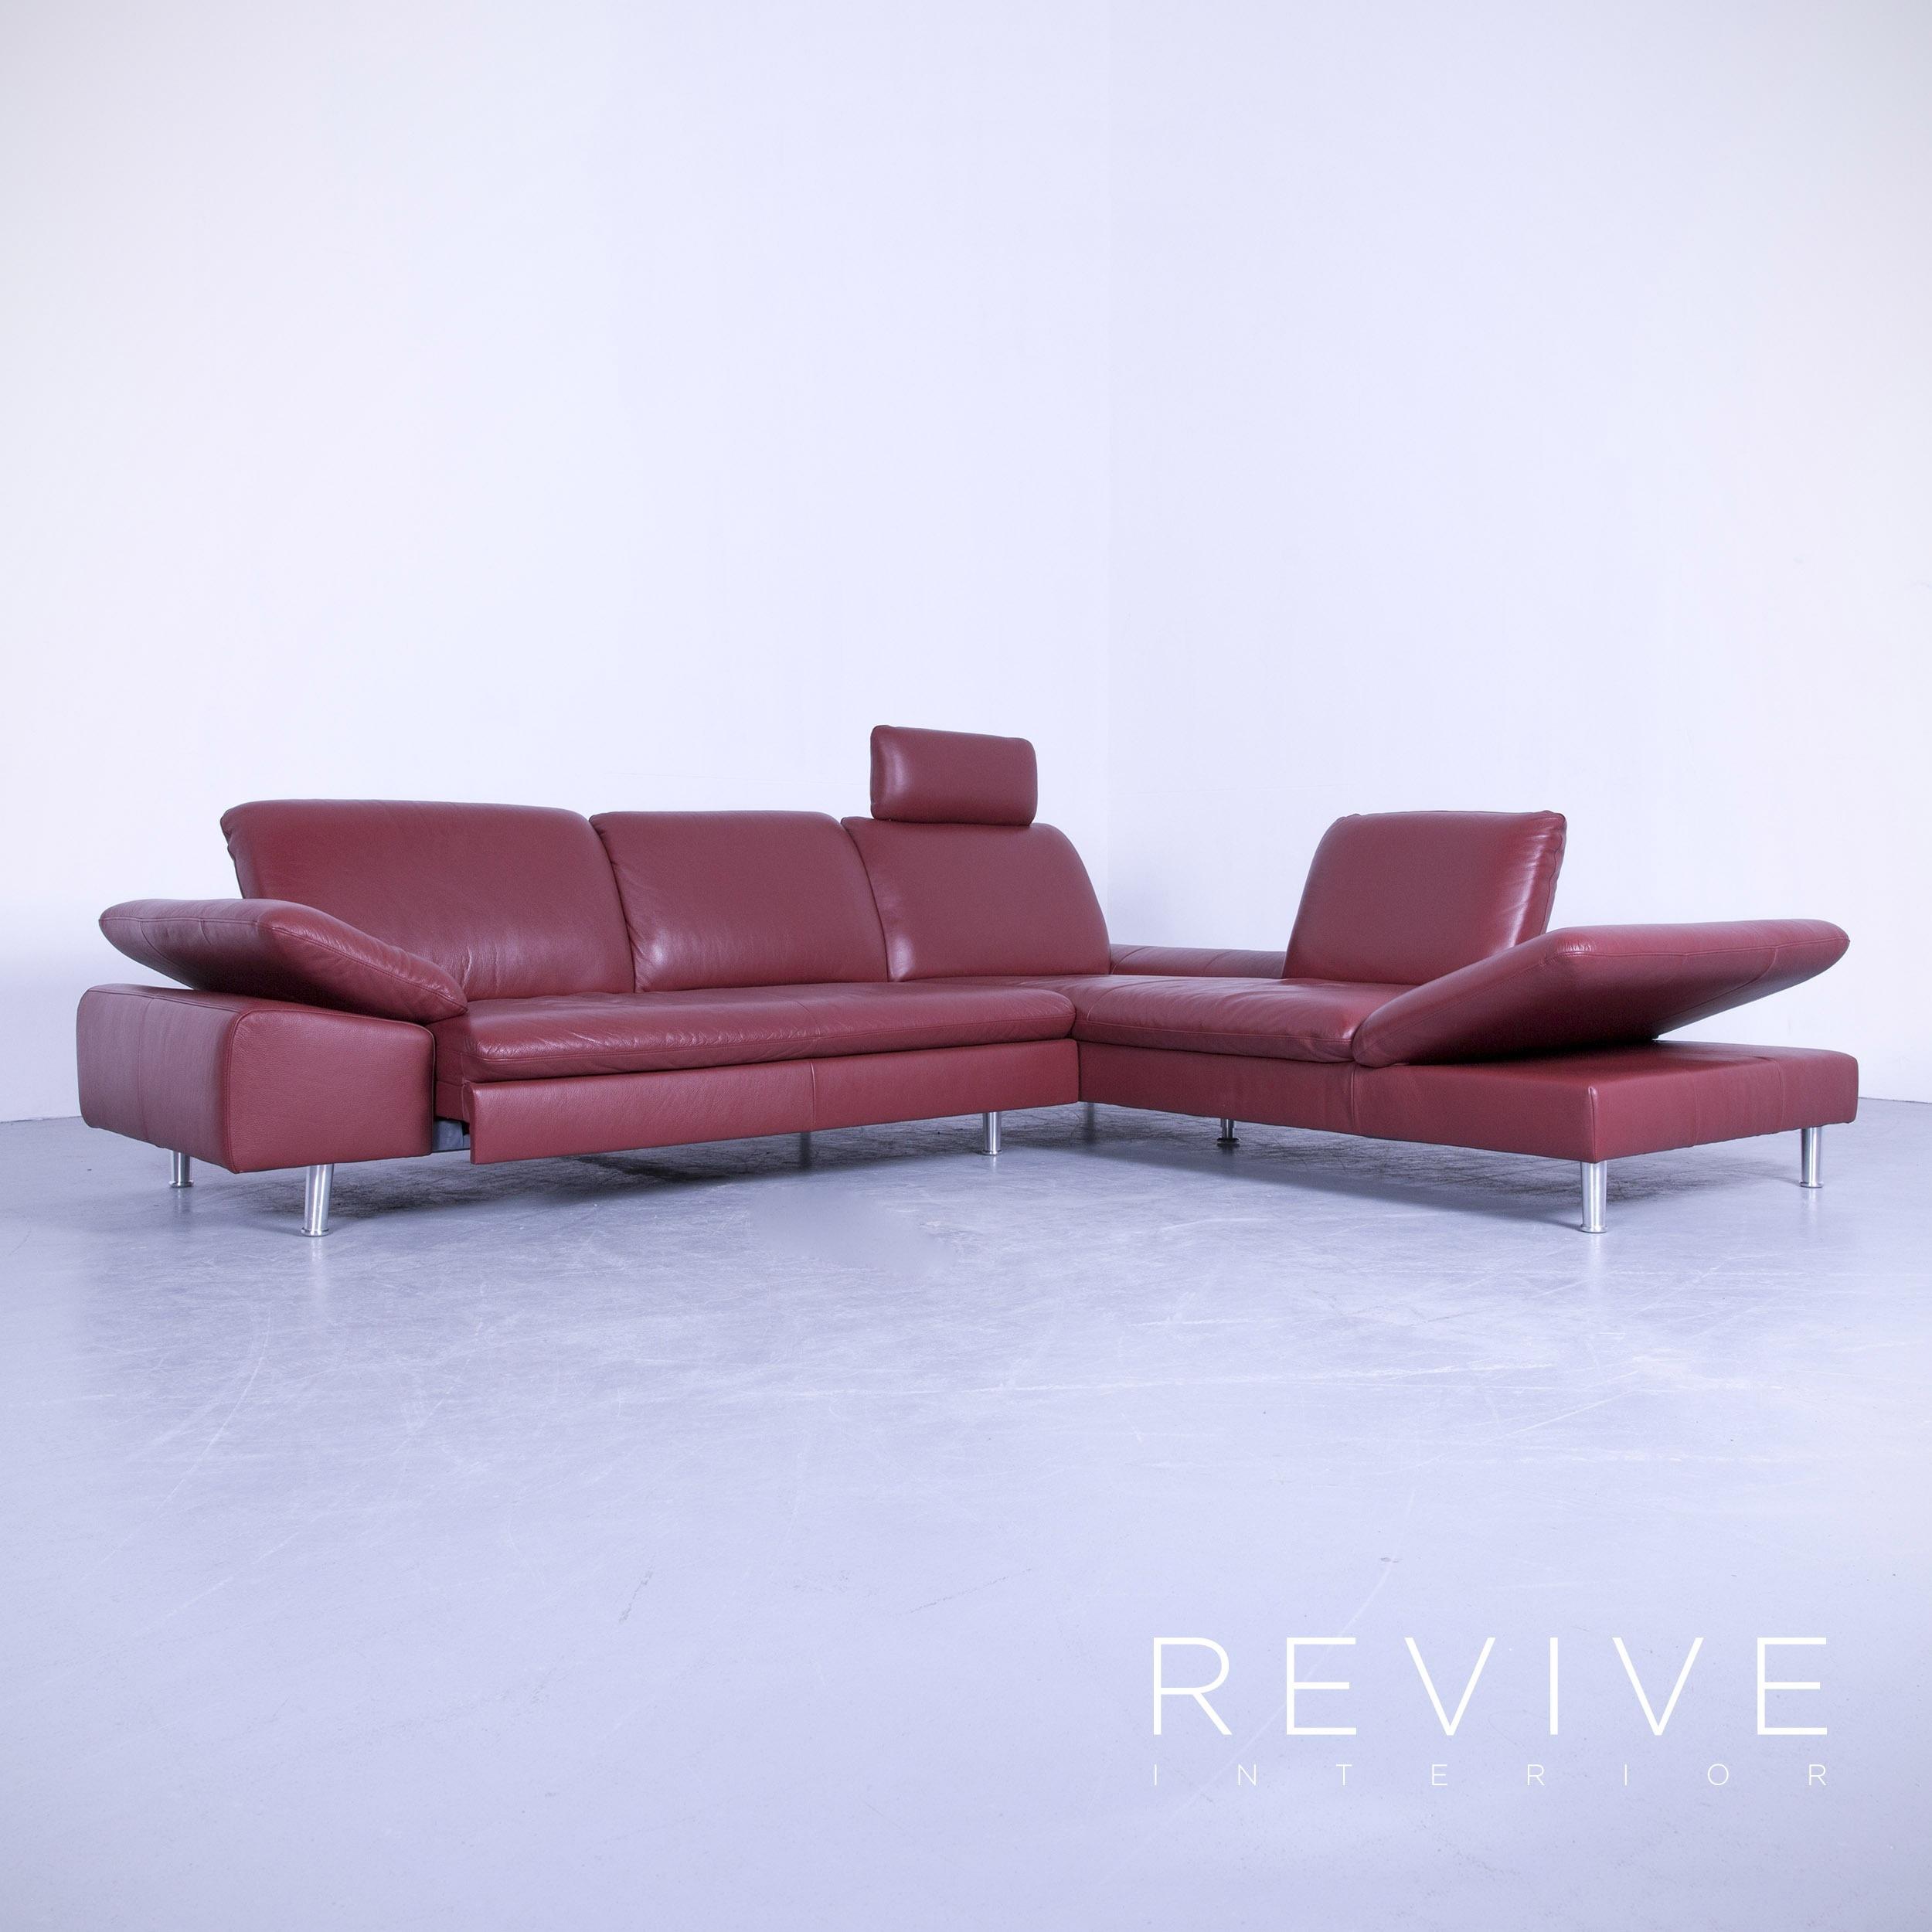 mobel boss sofa cool fotos mobel boss sofa frisch moebel boss ecksofa mit von mobel boss sofa